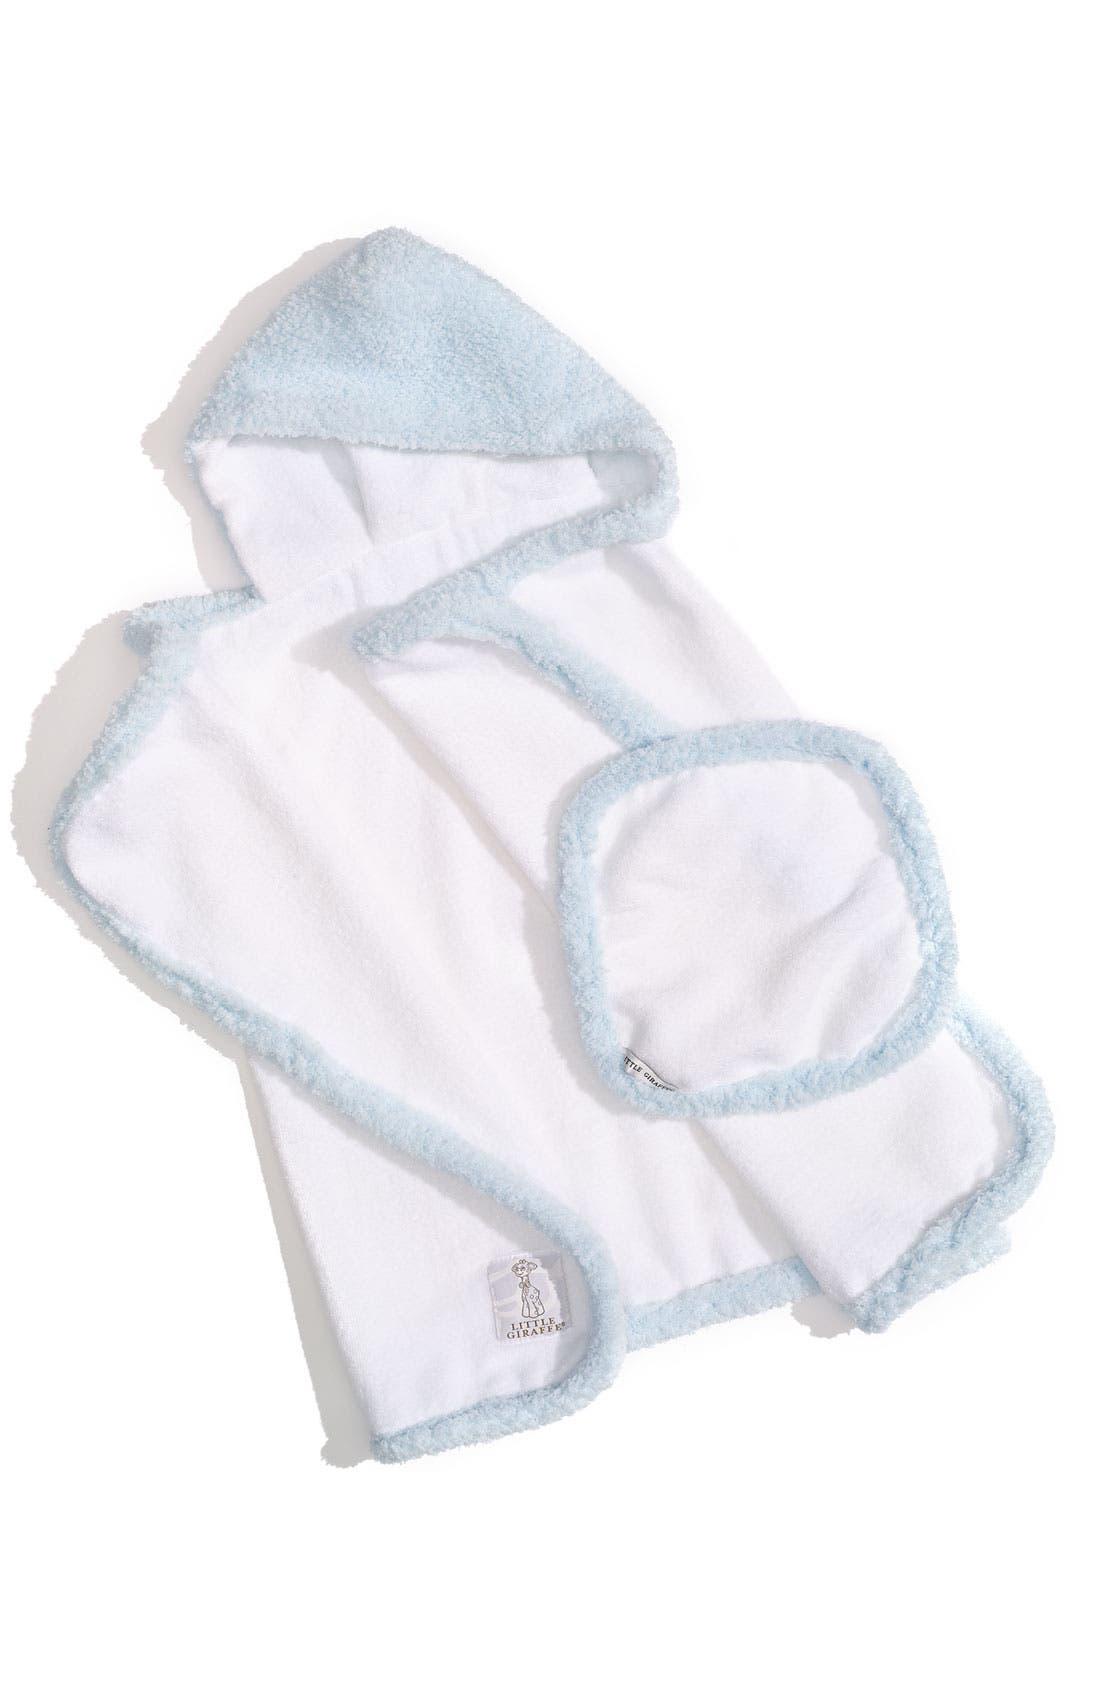 Alternate Image 1 Selected - Little Giraffe Towel & Washcloth Set (Infant & Toddler)